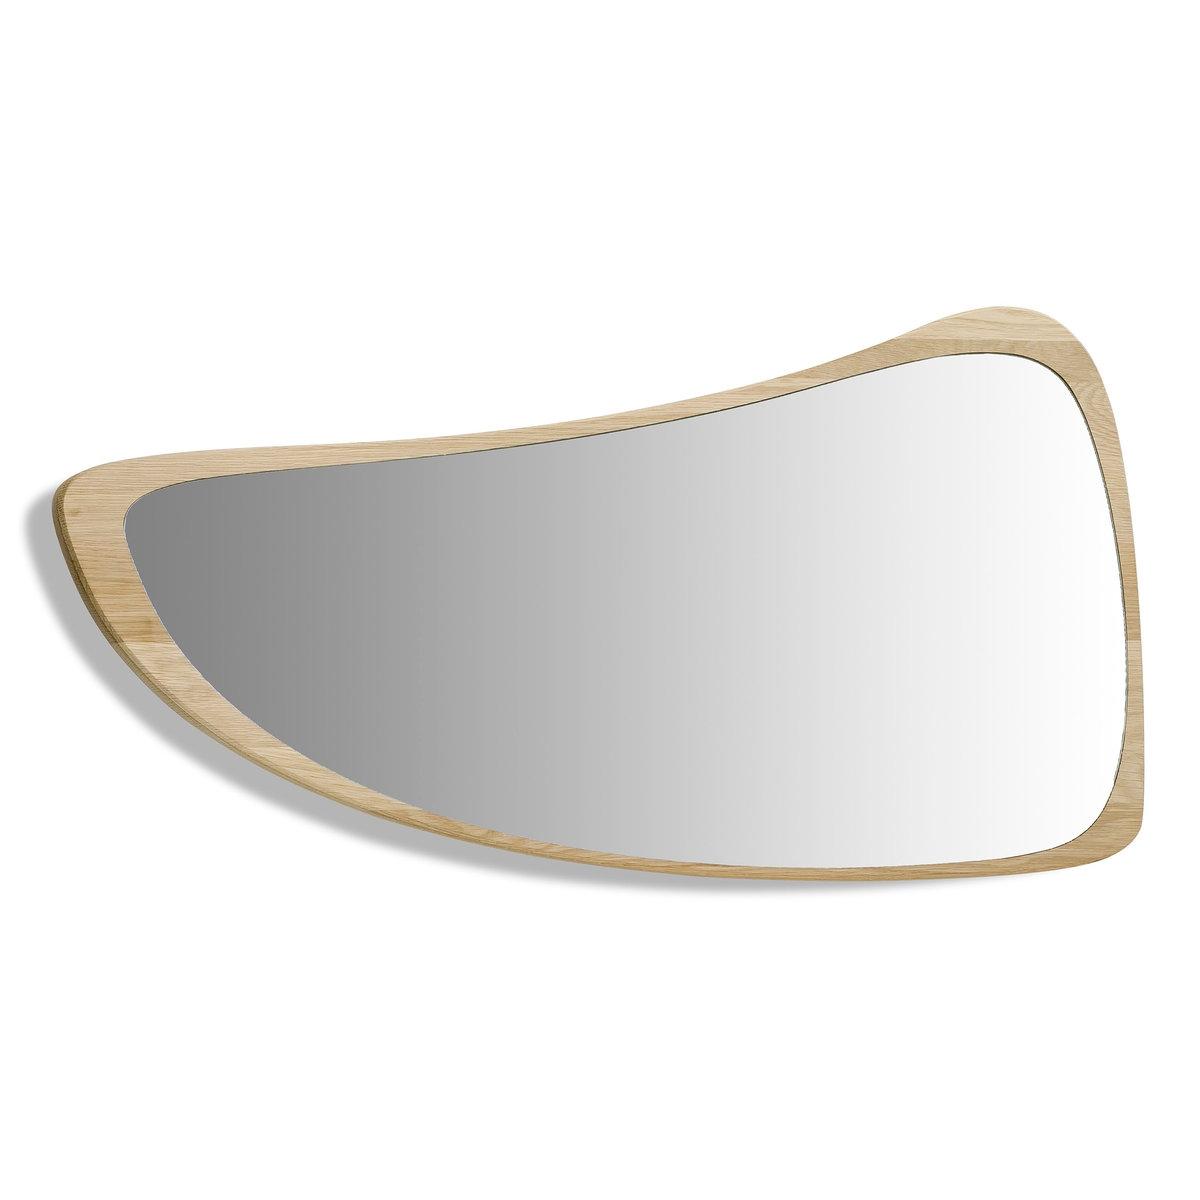 Зеркало Д78 x  В42 см, Principe<br><br>Цвет: серо-бежевый